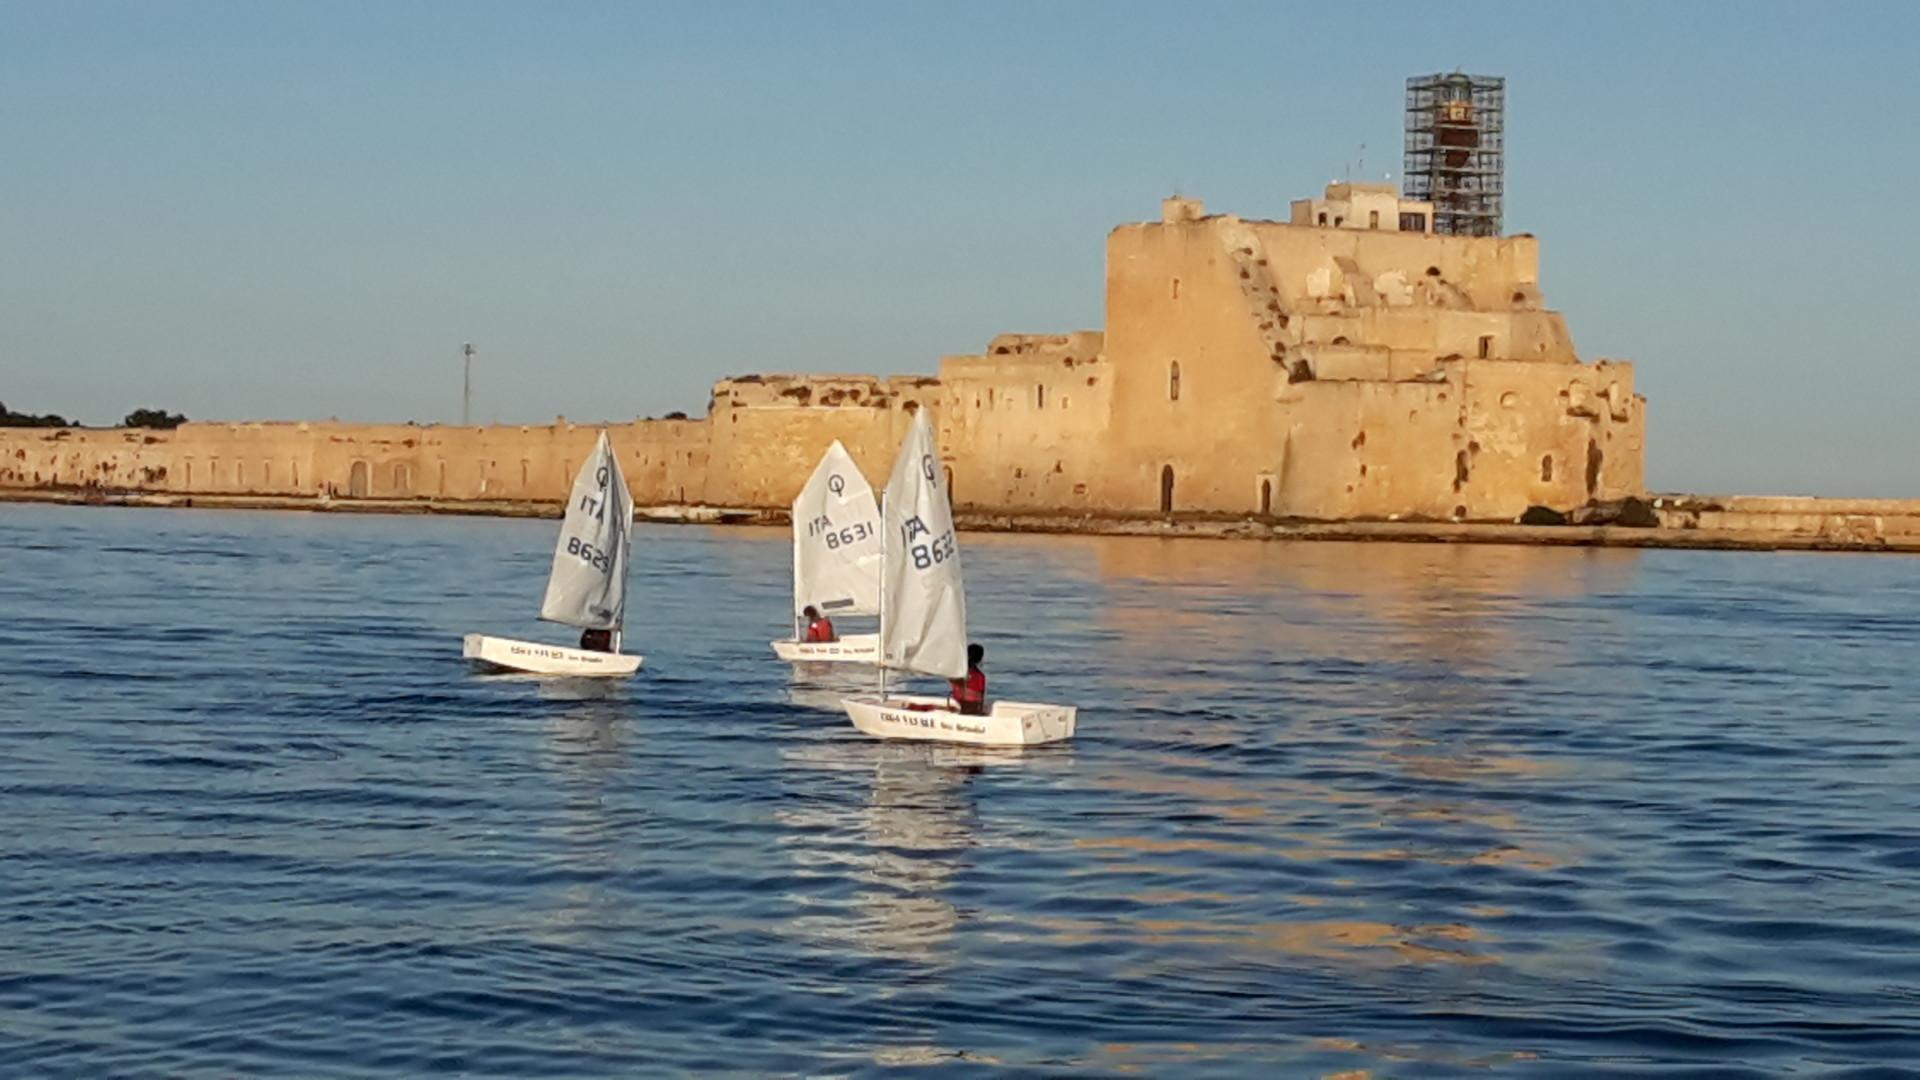 Scuola-di-vela-lega-navale-LNI-Brindisi (13)